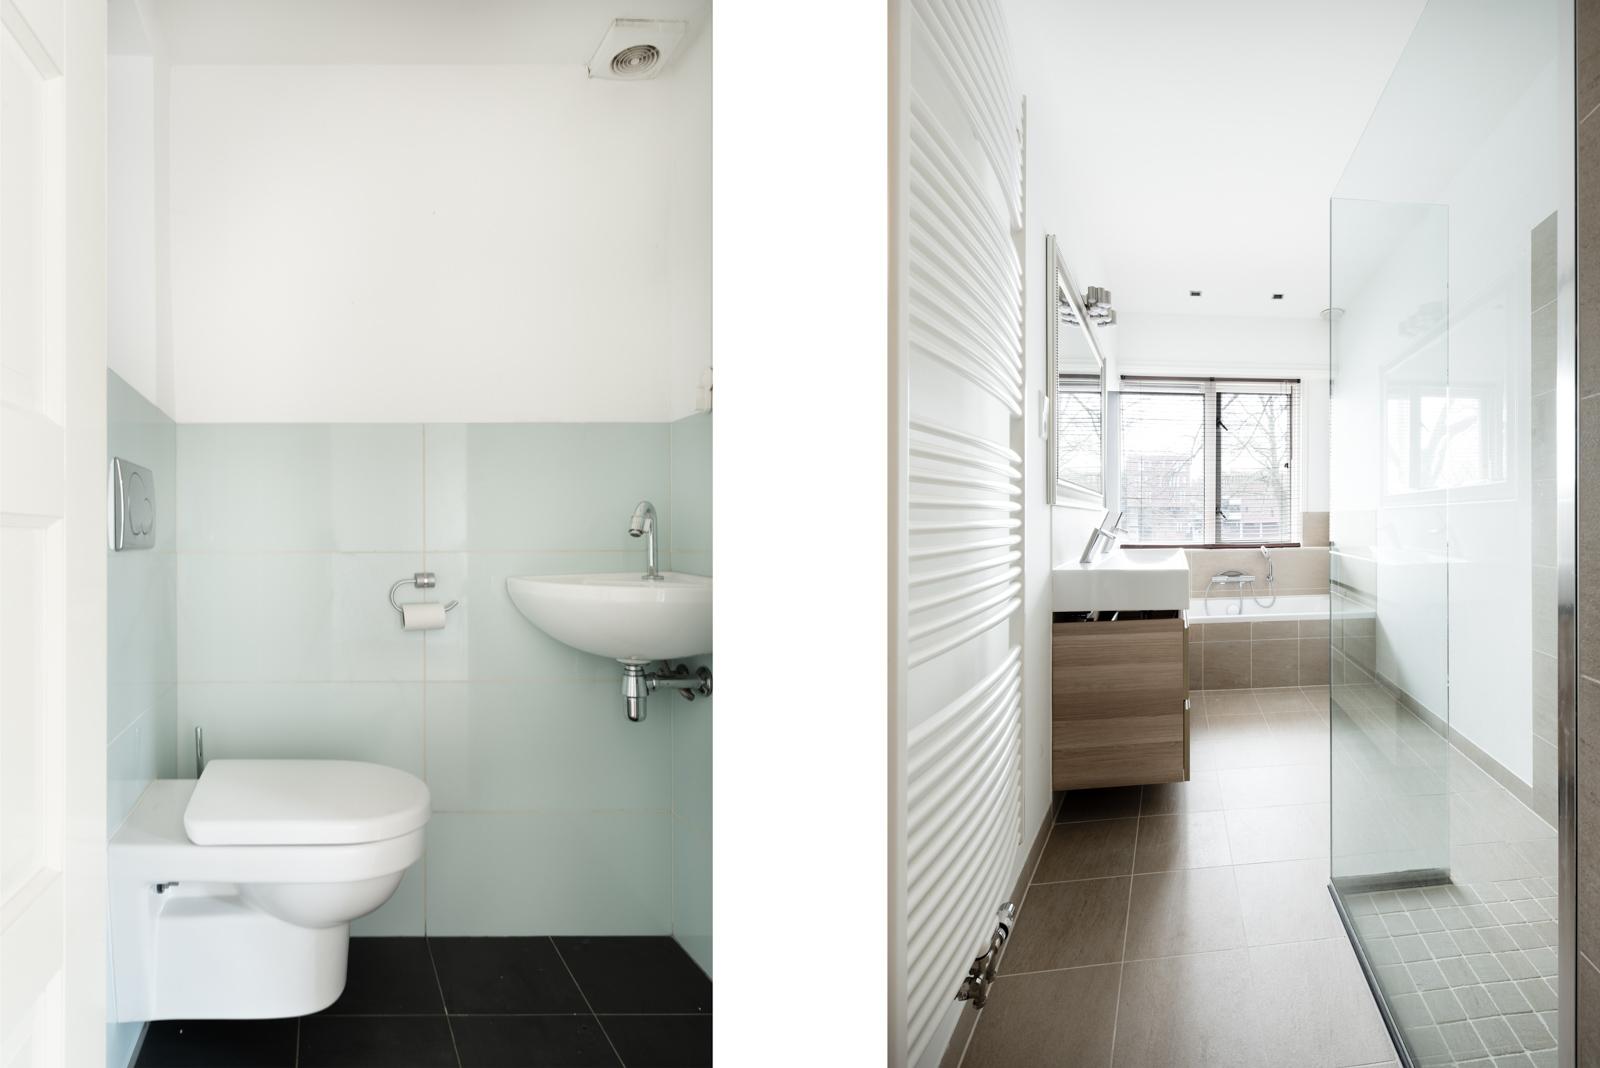 Vastdoed interieur woningfotografie Zalmiy Paeez Fotografie Noord-Holland Haarlem Heemstede